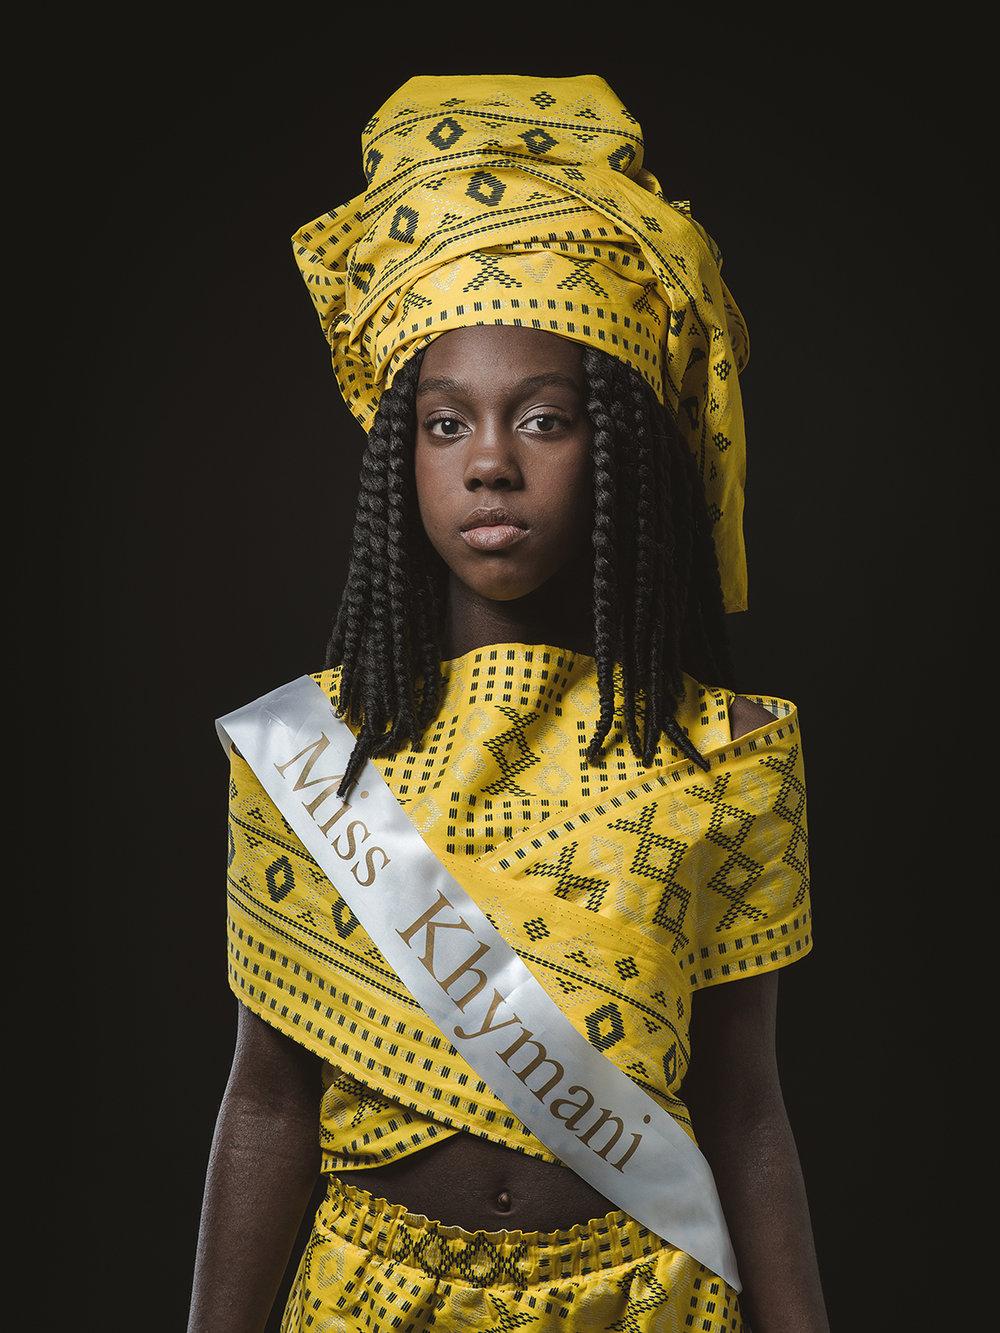 Khumani, aged 12